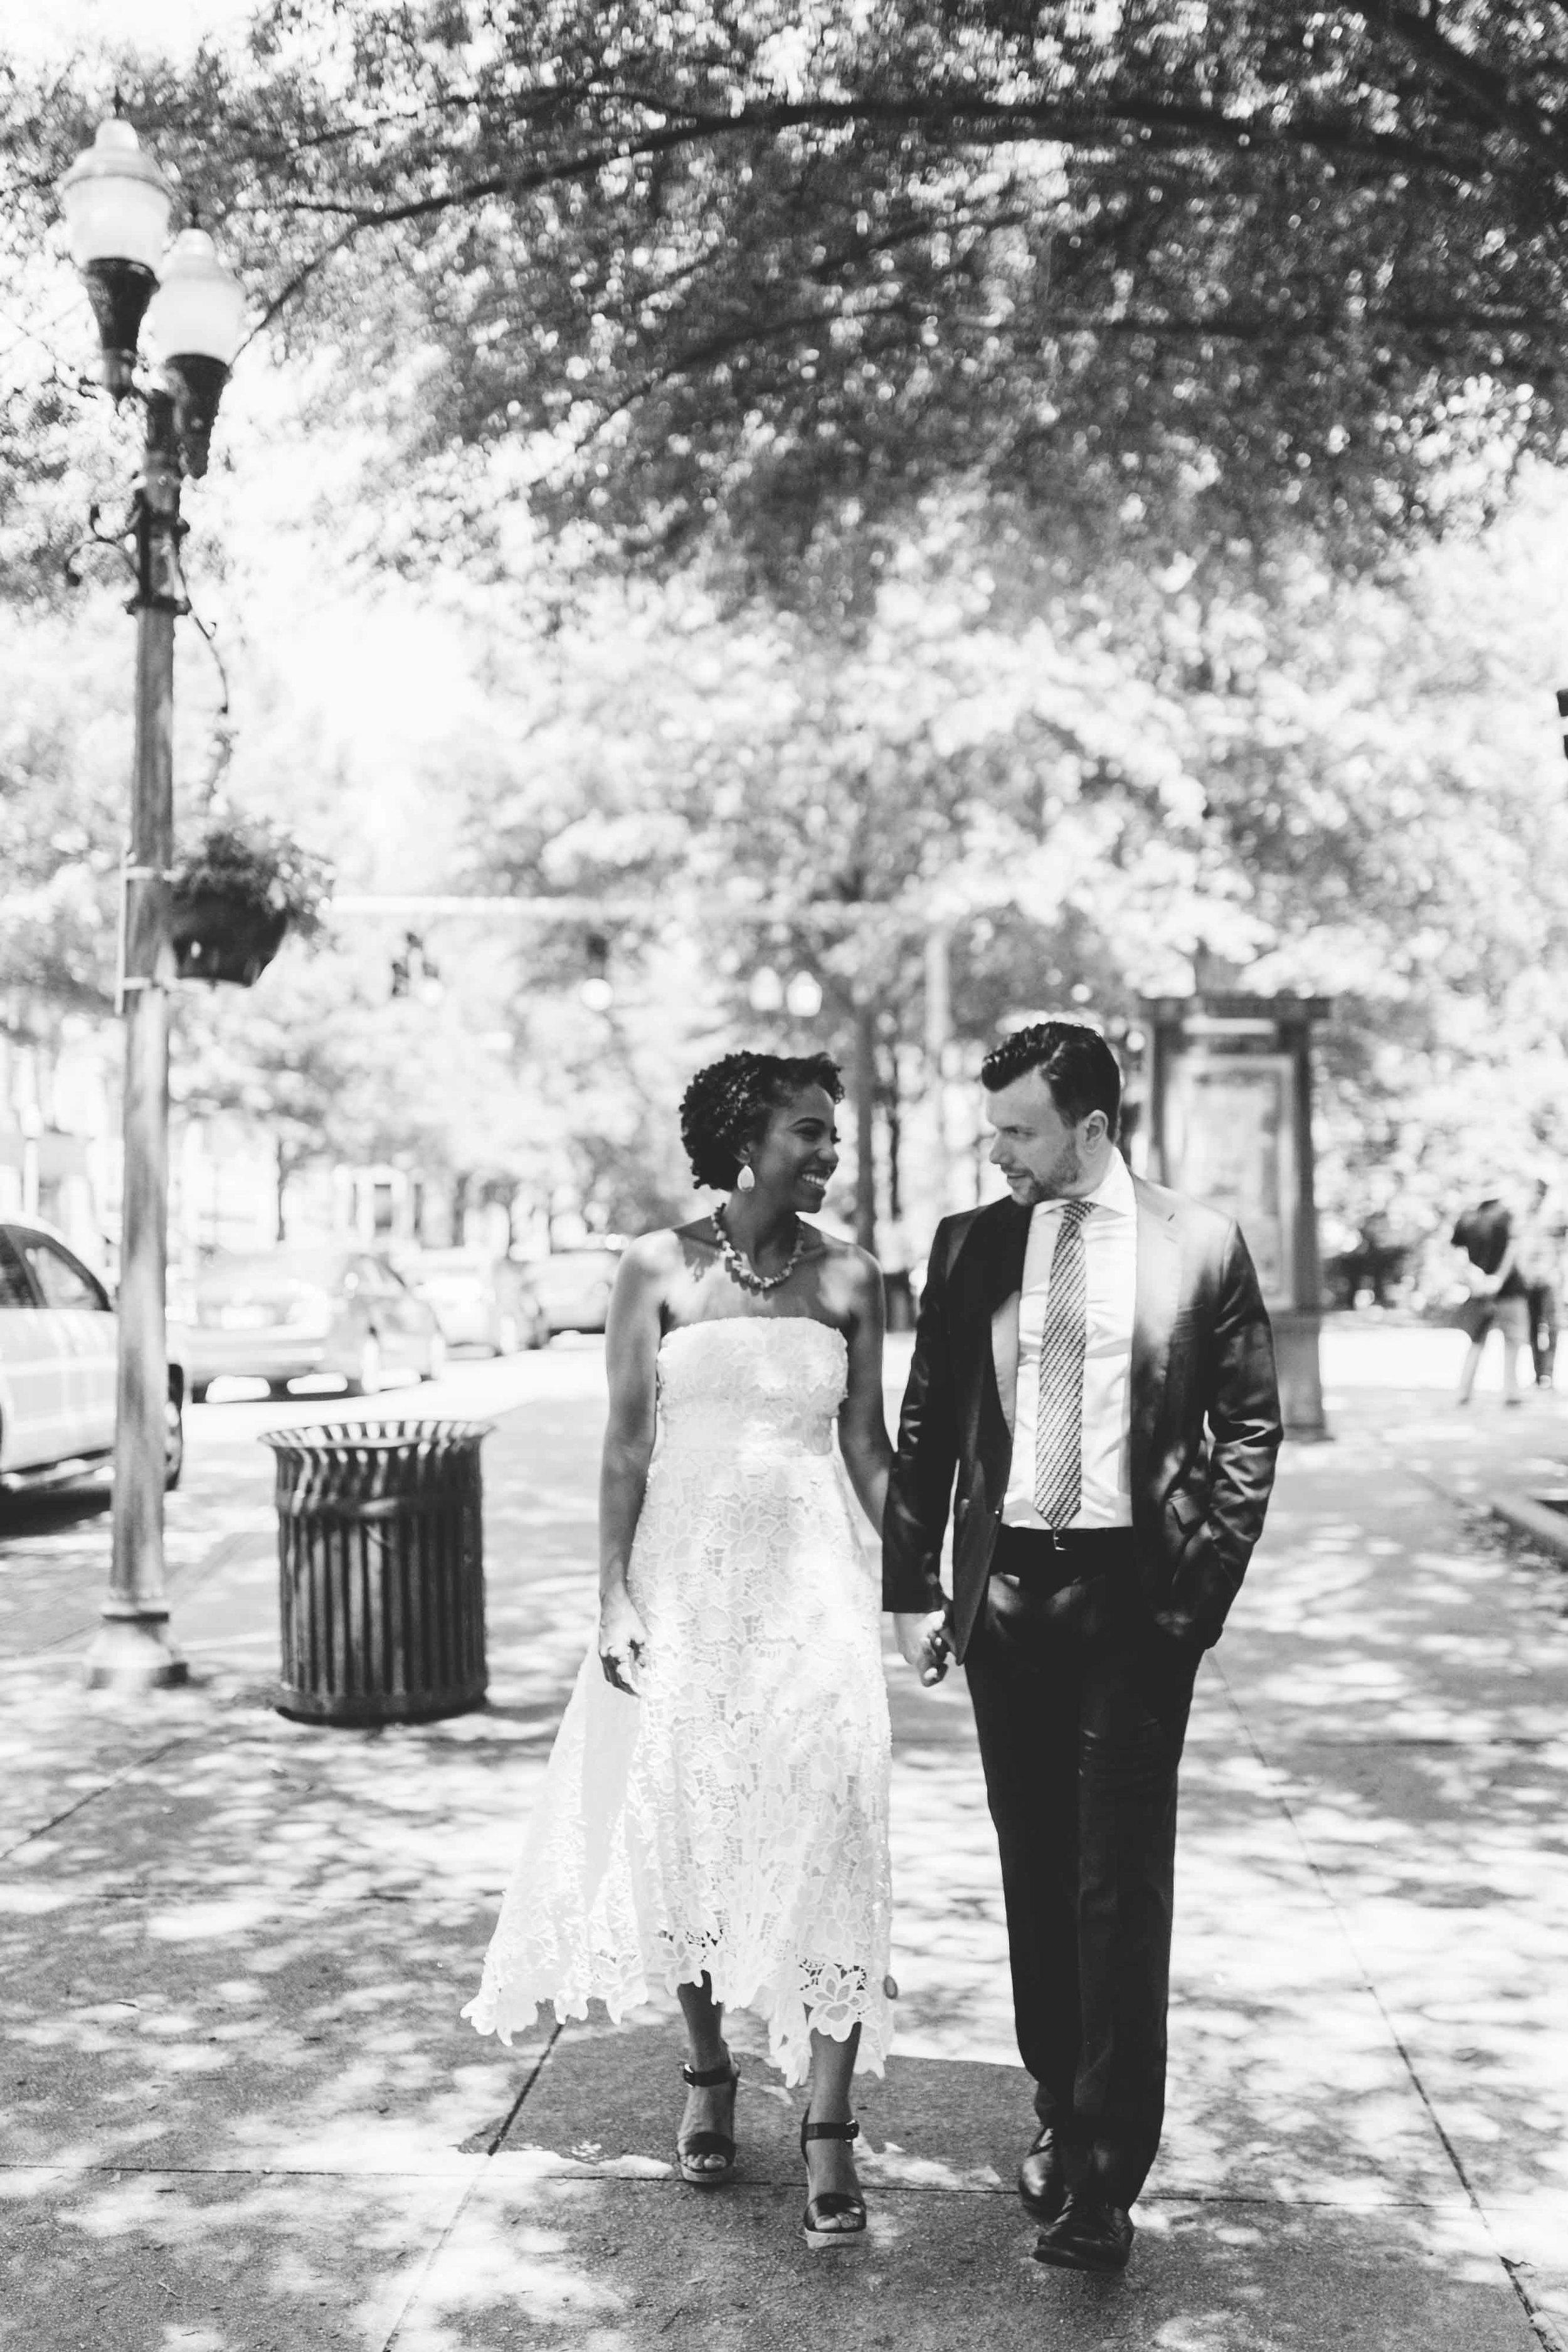 Dekalb-County-Courthouse-Wedding-Photos-Kiyah-C-Photography-53.jpg